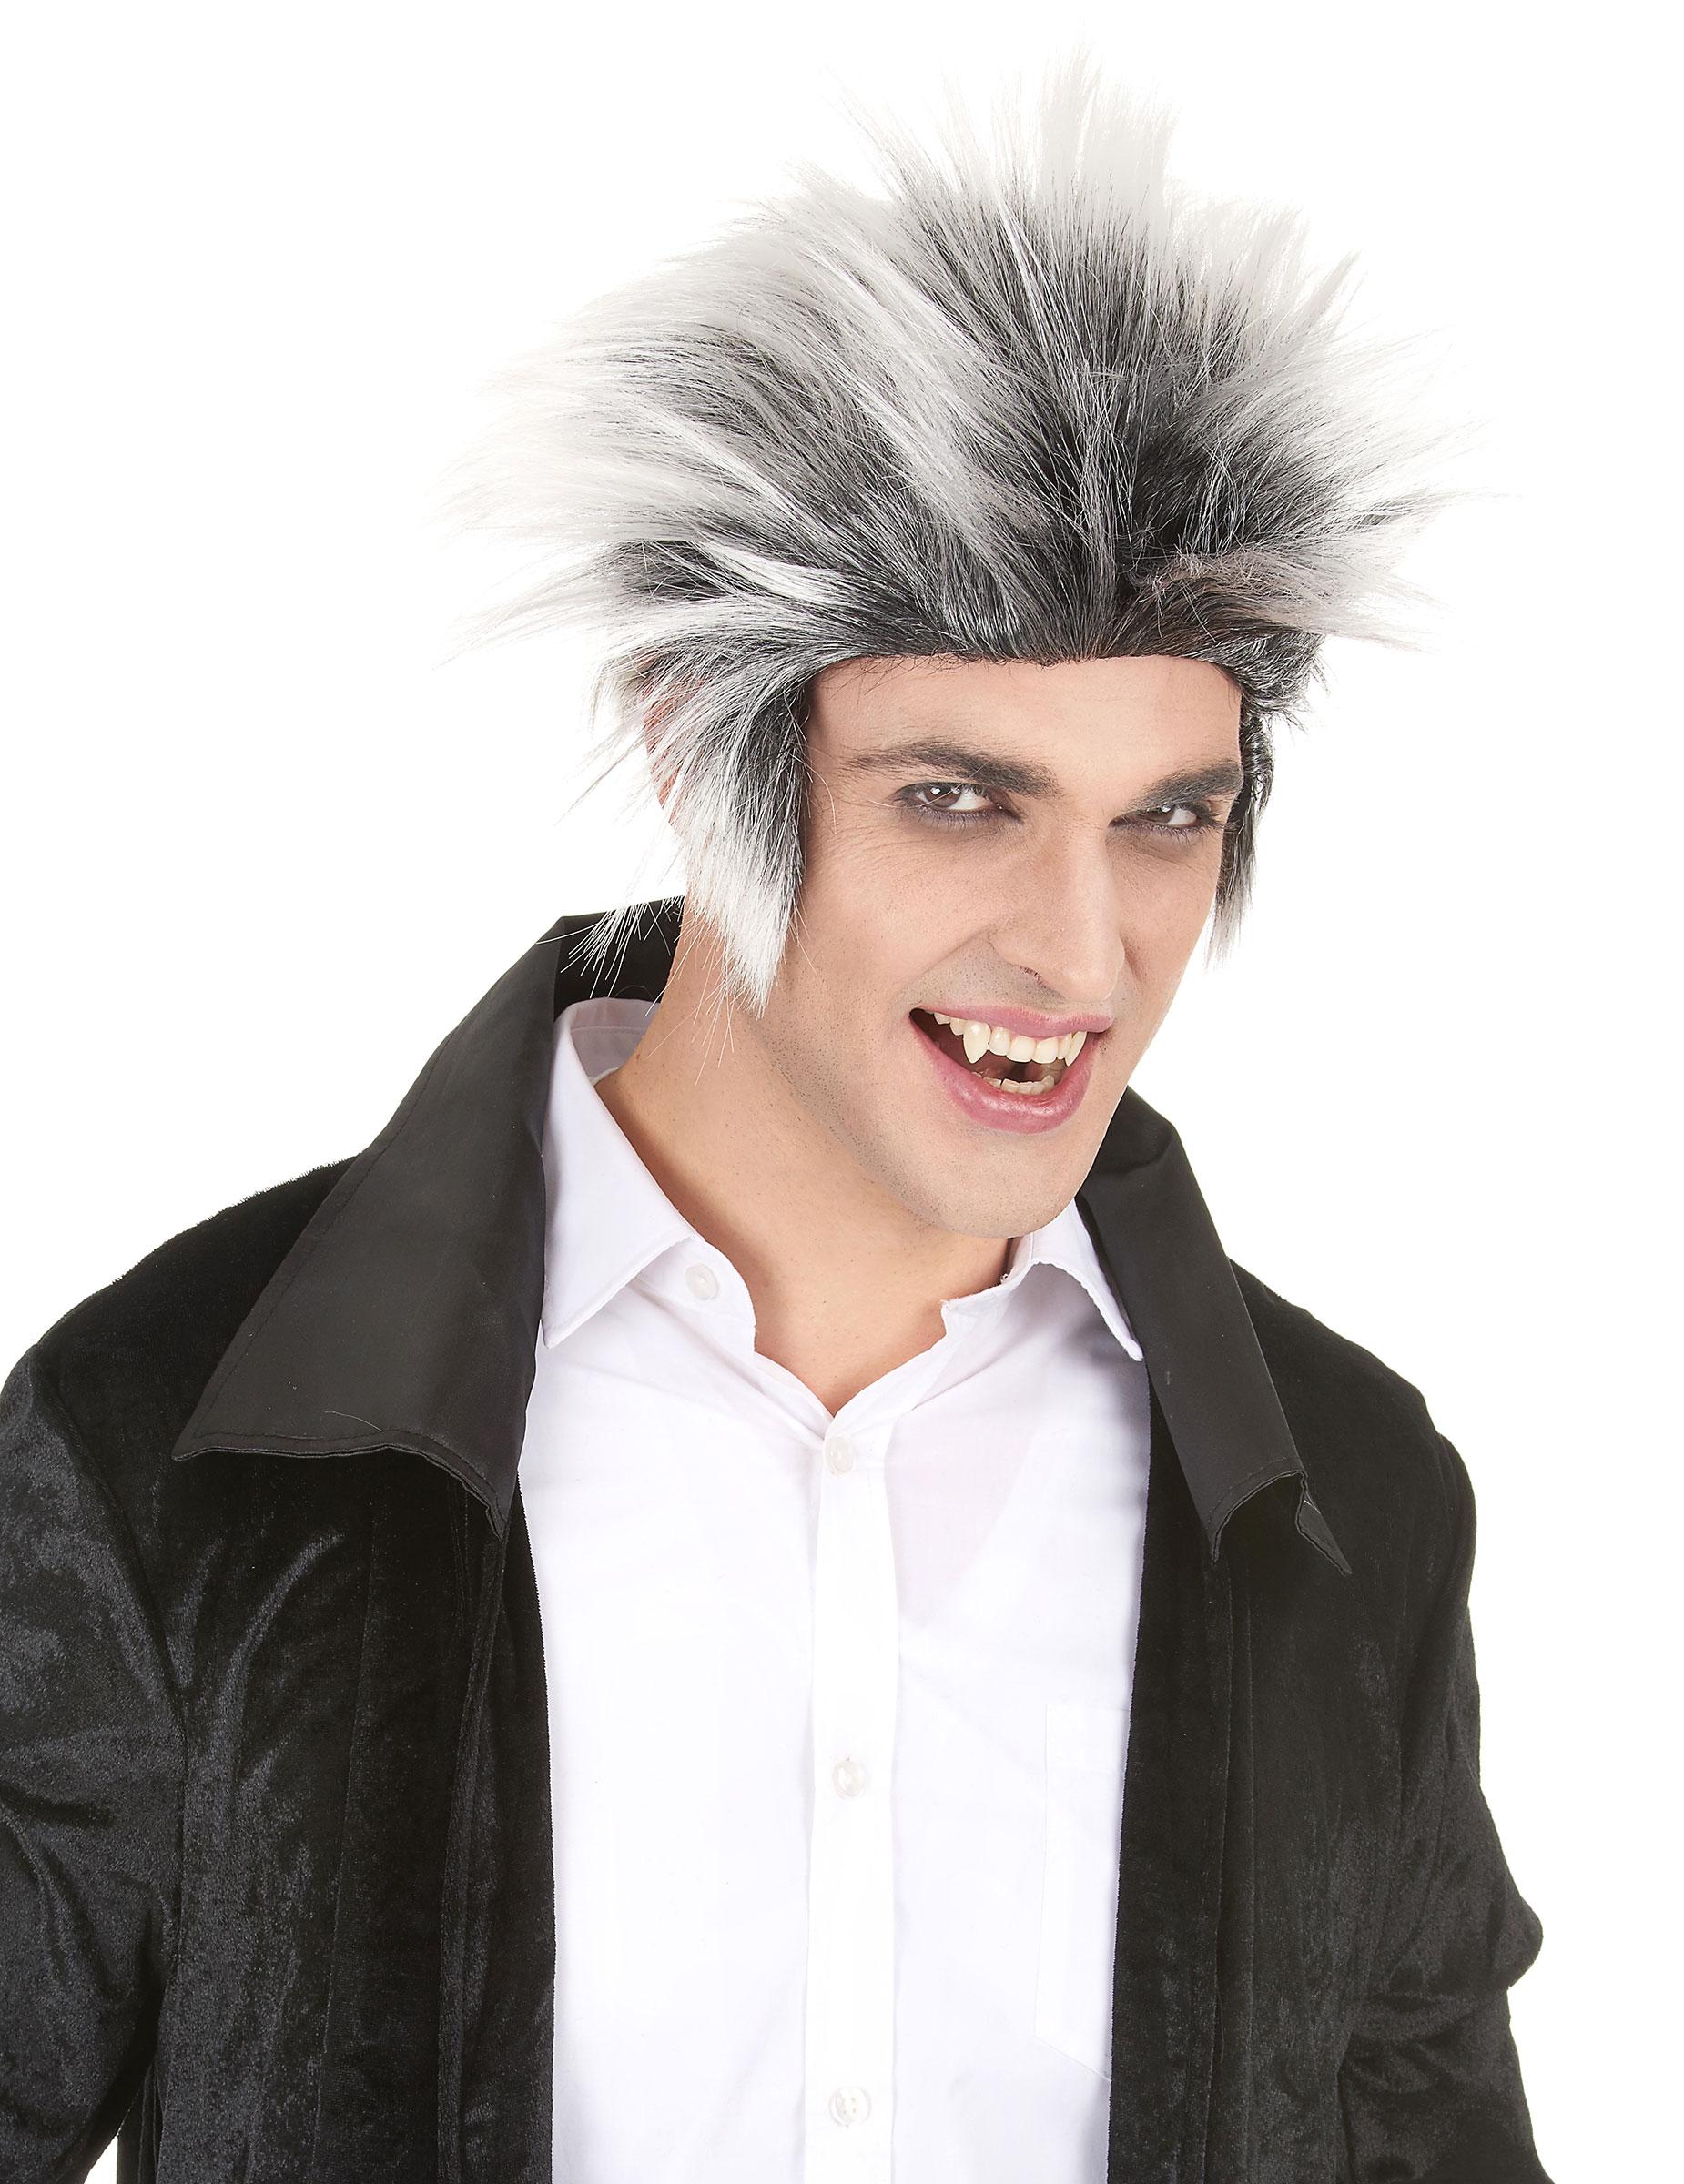 Parrucca dafulminatocon capelli bianchi e neri per adulto  Parrucche ... 6c3be7ddf6b9